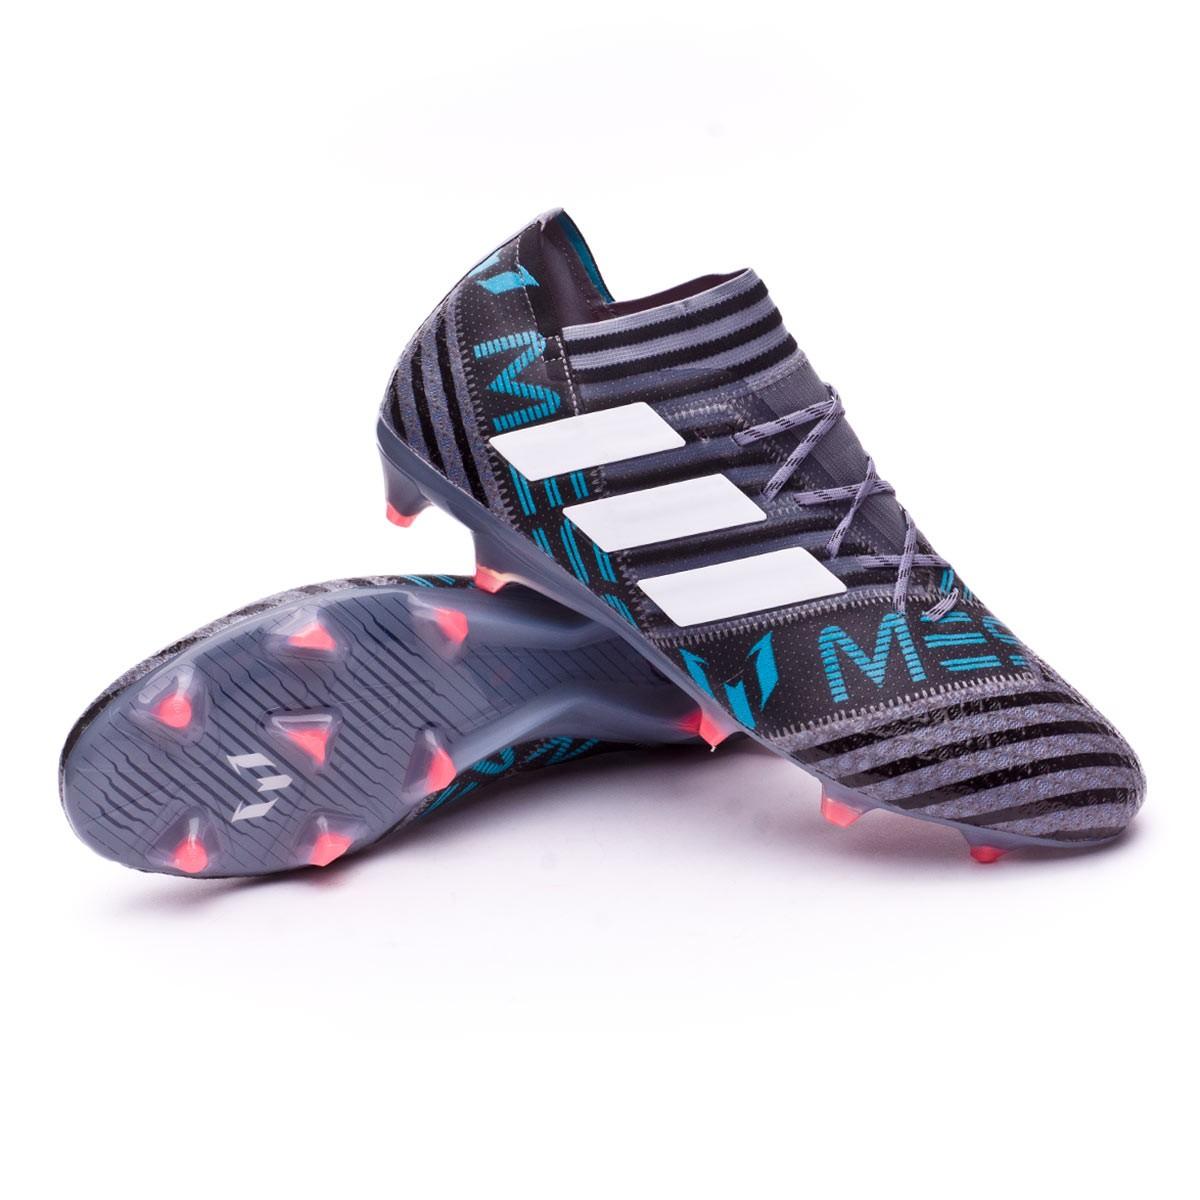 check out b9a54 8ec96 adidas Nemeziz Messi 17.1 FG Football Boots